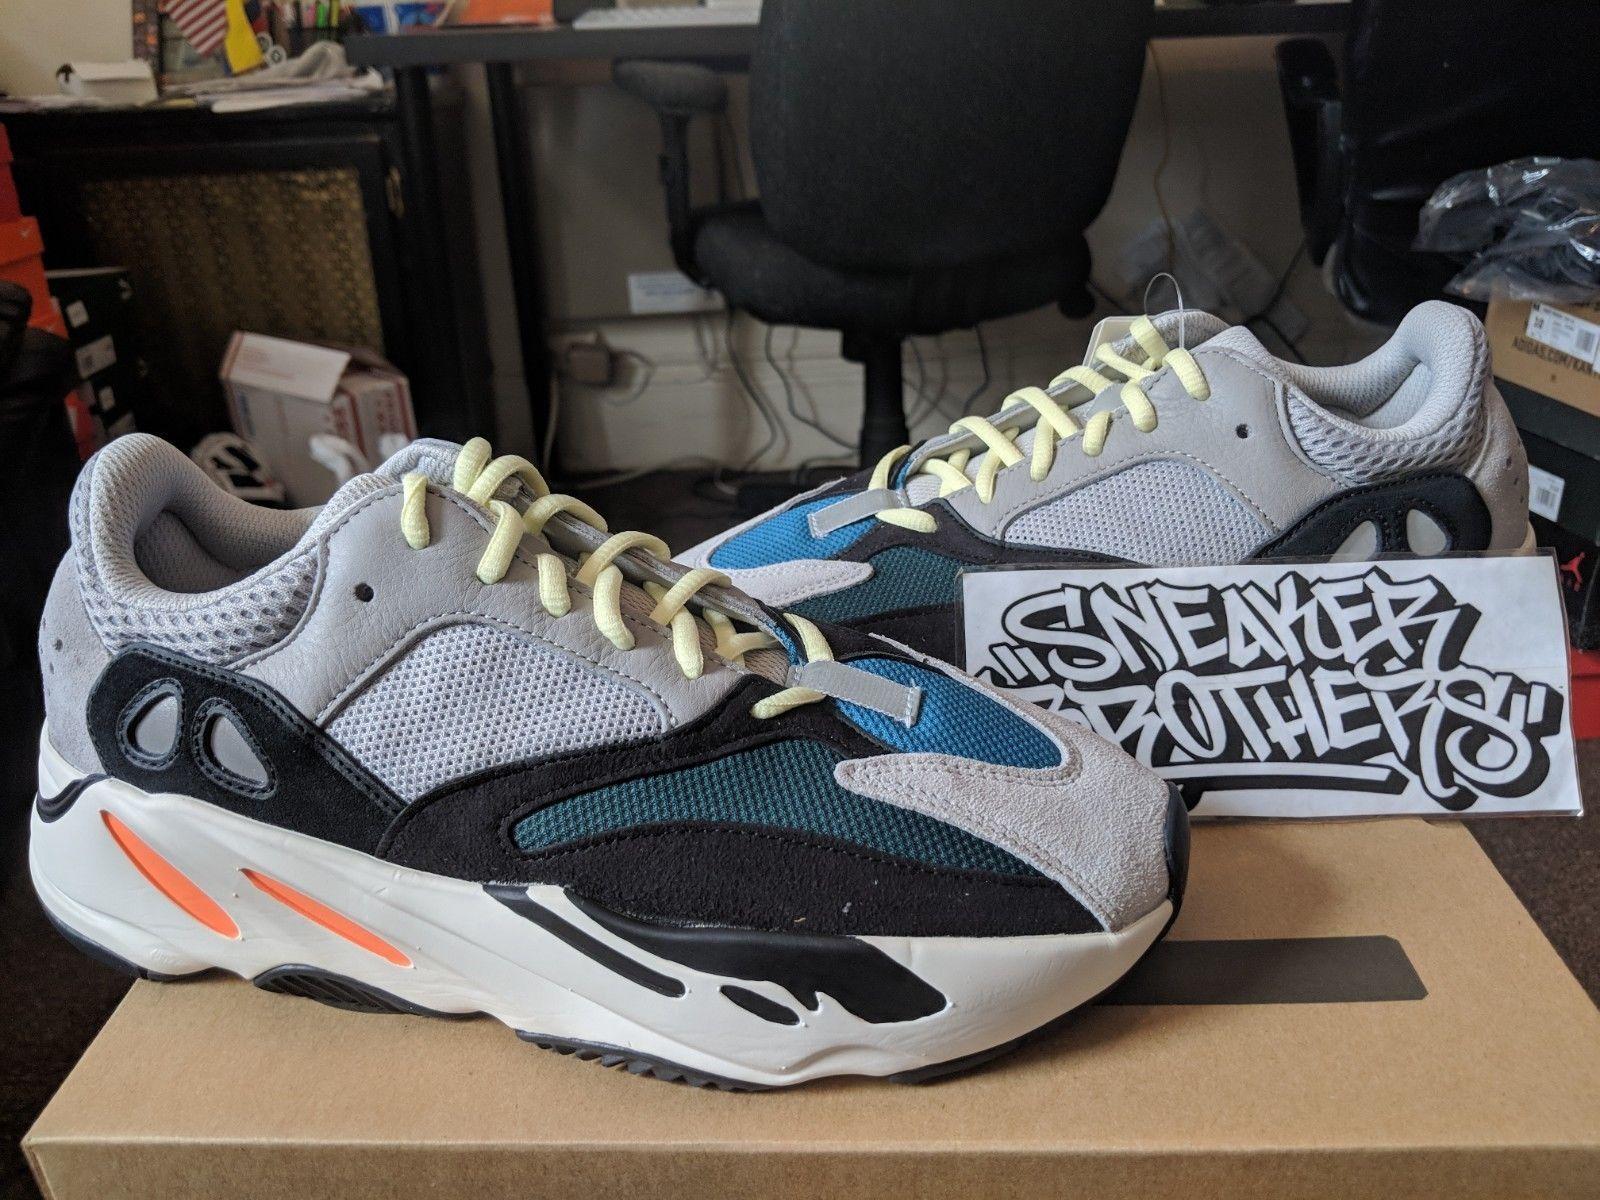 premium selection 14fa1 65fba 599.99 USD   Adidas Yeezy Boost 700 Wave Runner OG Grey Core White Black  Kanye West